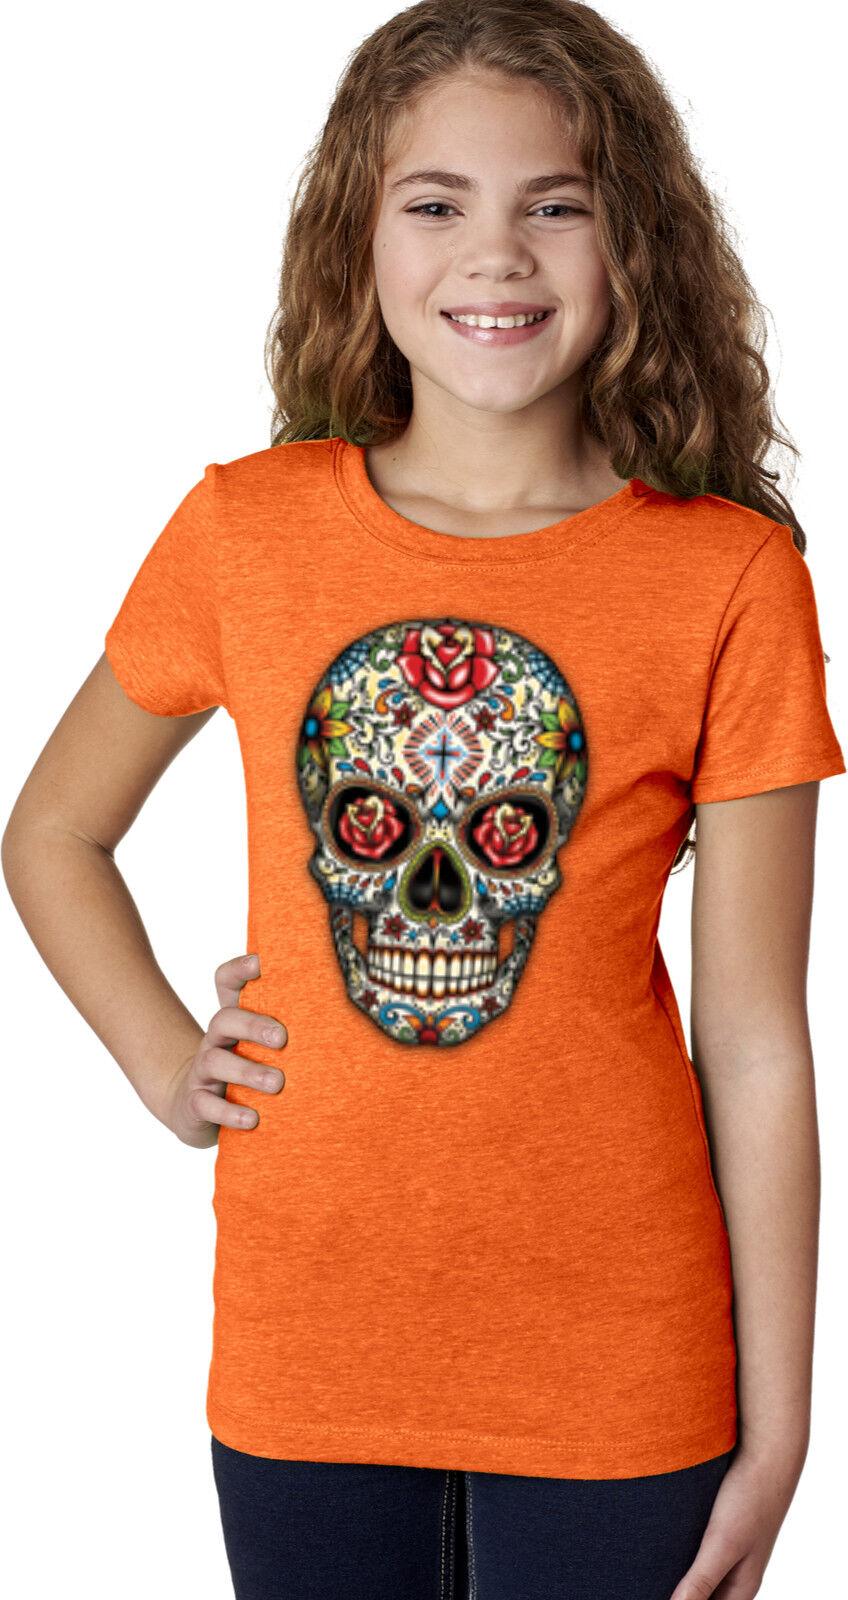 "Girls Rhinestone Suds T-Shirt /"" Colorful Sugar Skull /"" Size 3 to 14 Halloween"